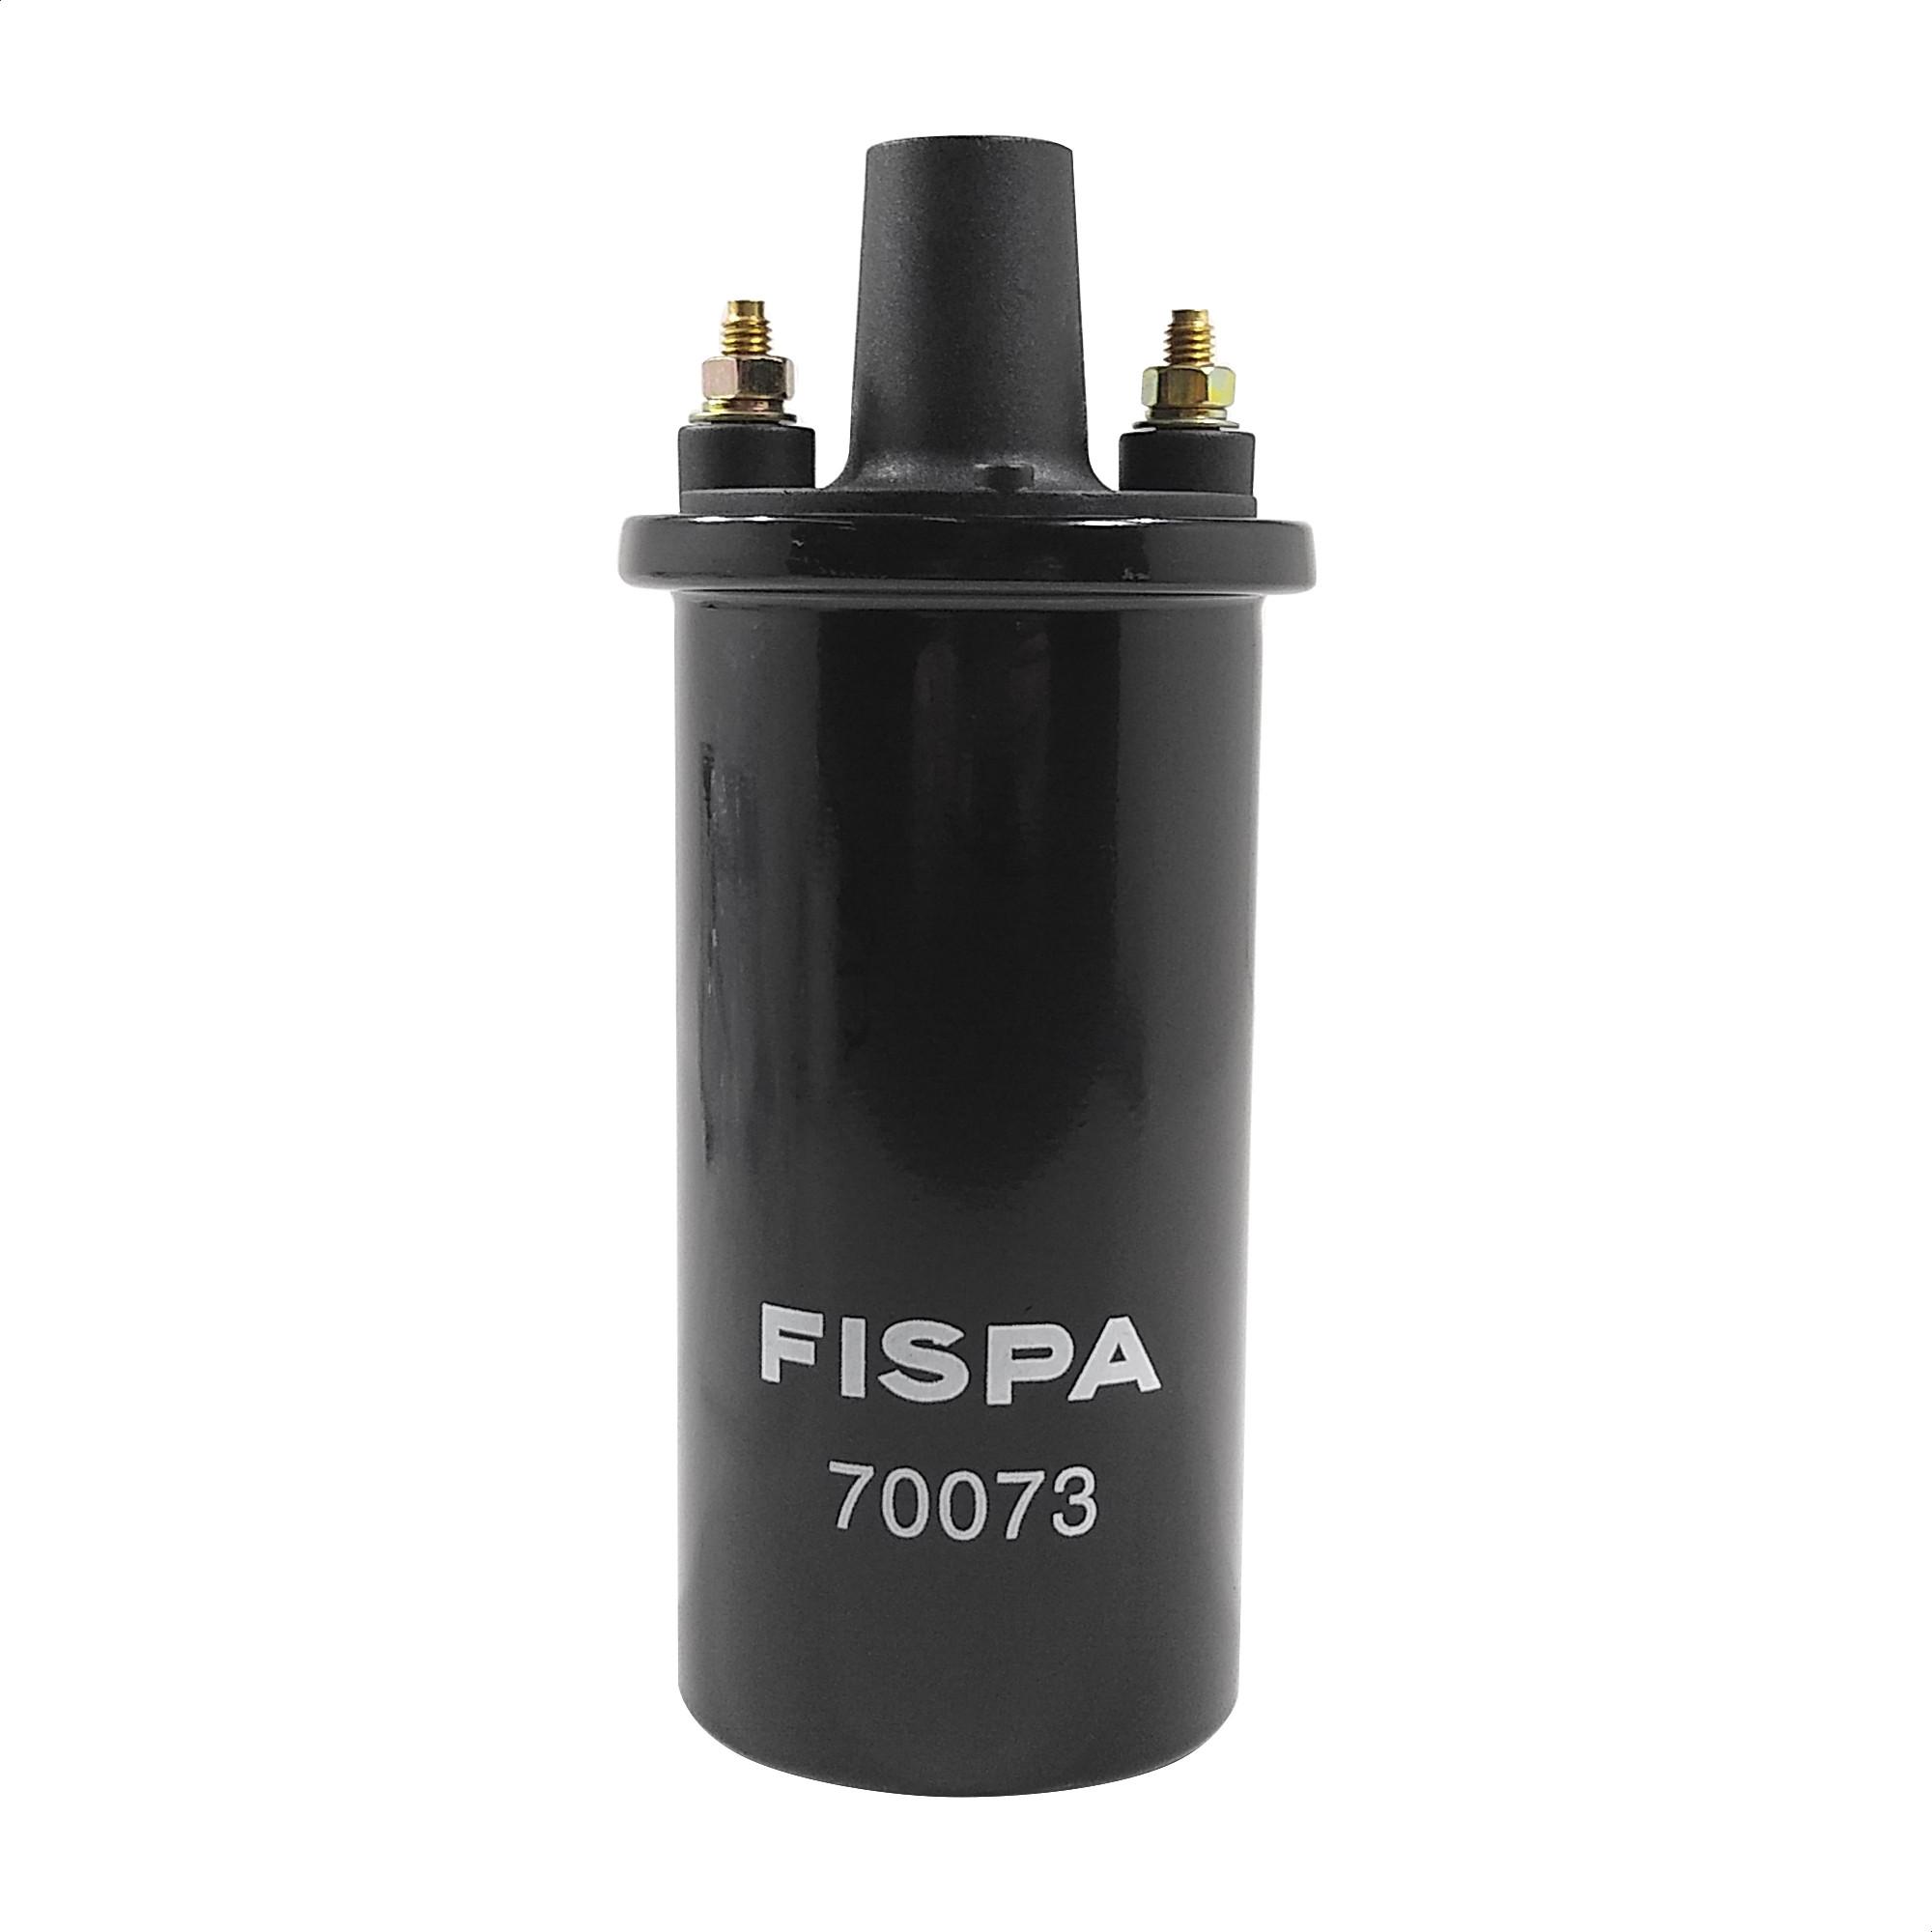 Bobina Ignicion Auto 12 Volts Encendido Platinos Fispa 70073